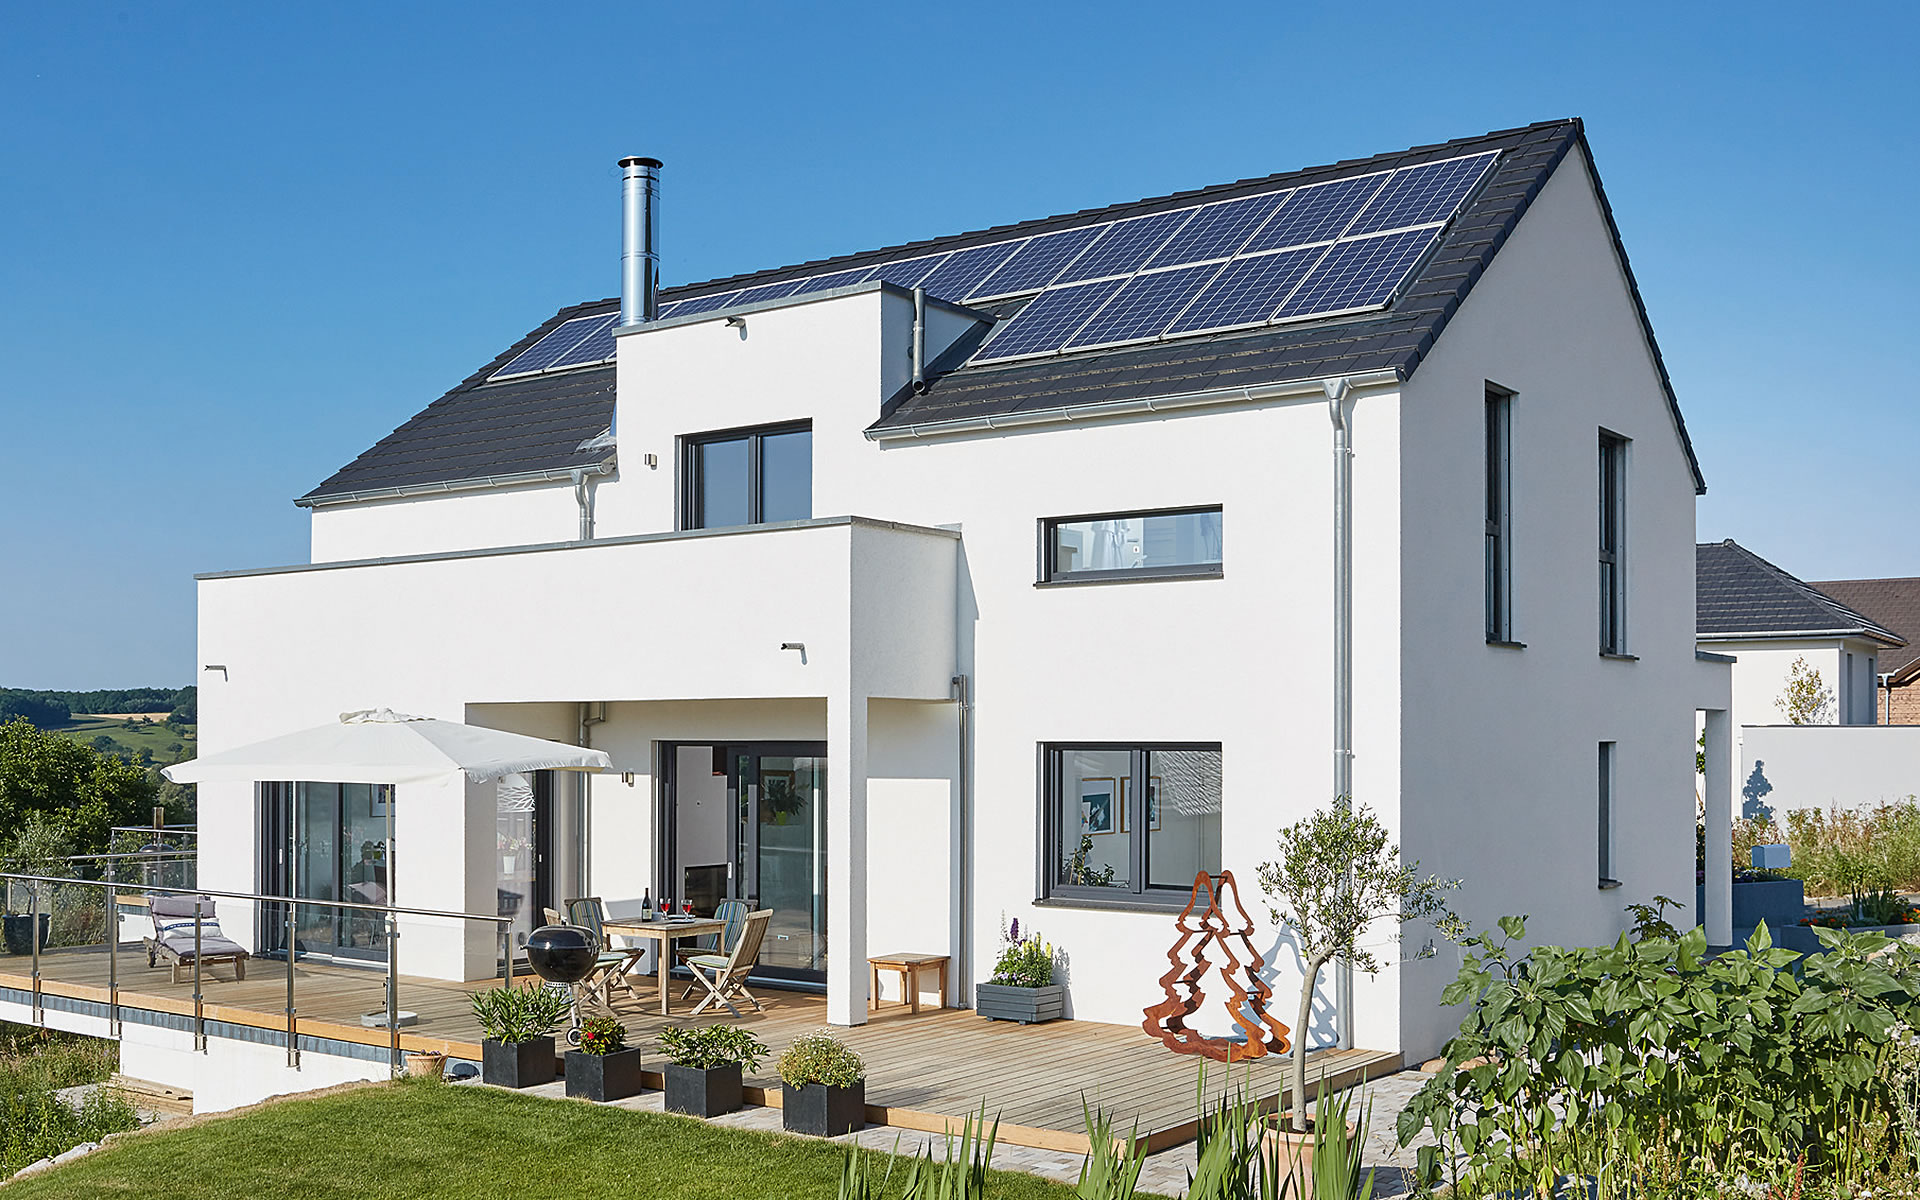 sunshine 310 (Reiter) - WeberHaus GmbH & Co. KG